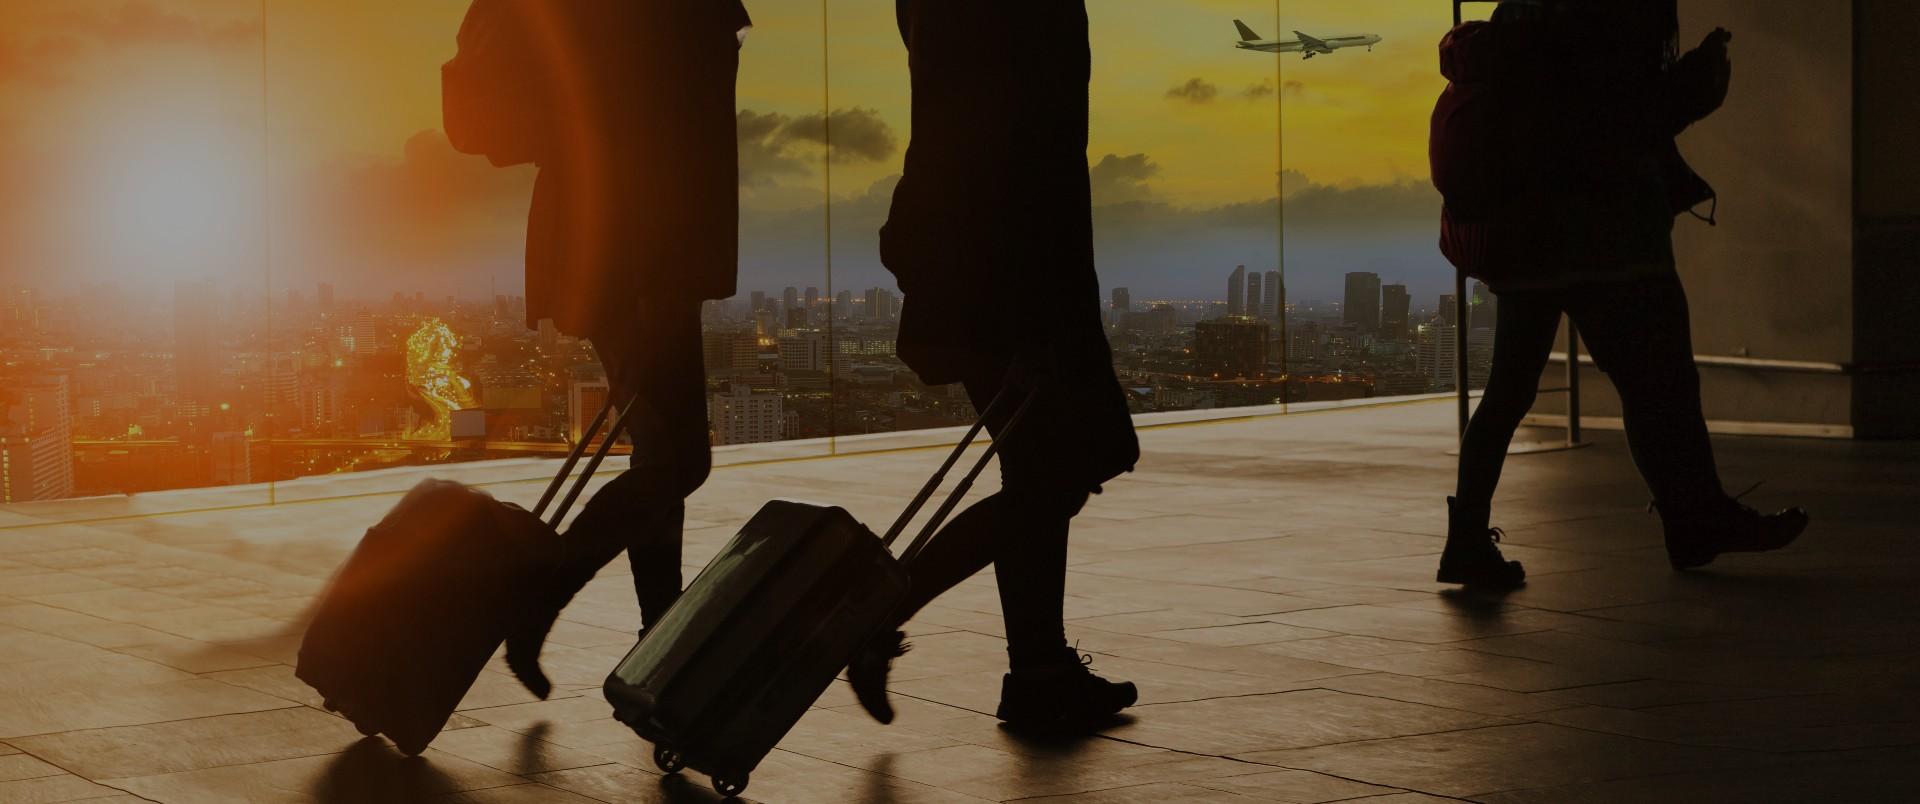 theICEway & Travel